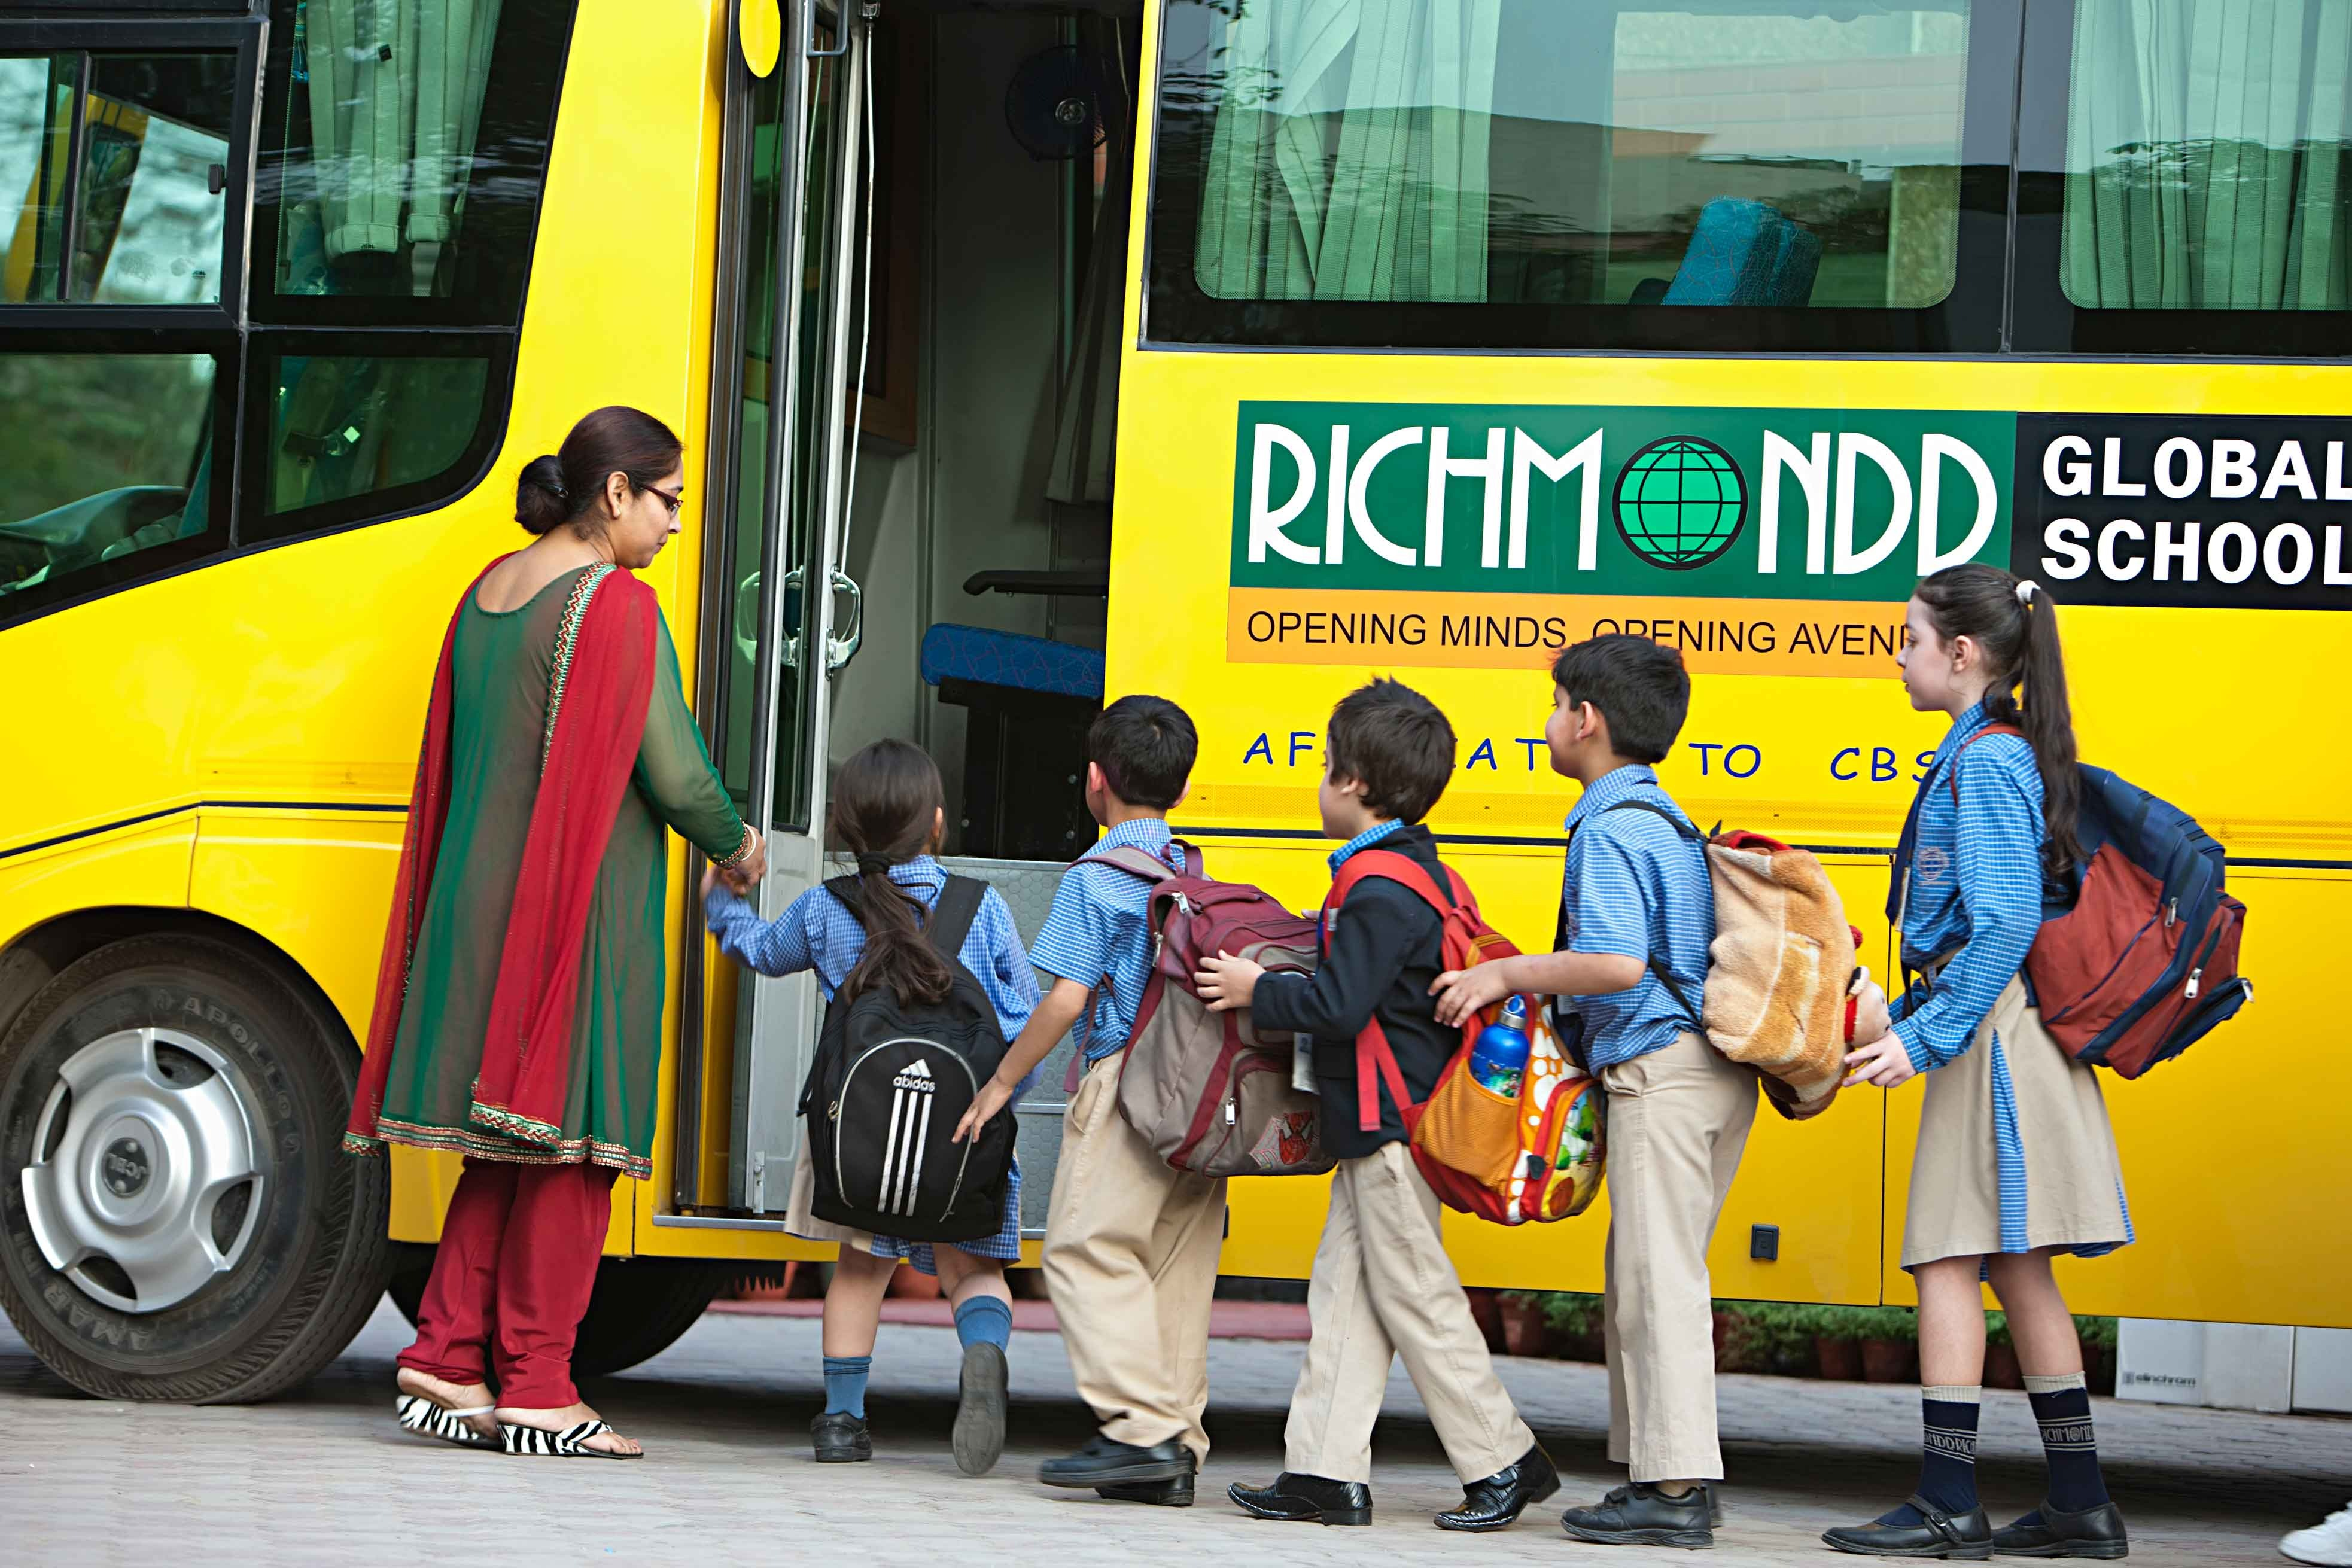 Richmondd Global School Paschim Vihar West Delhi